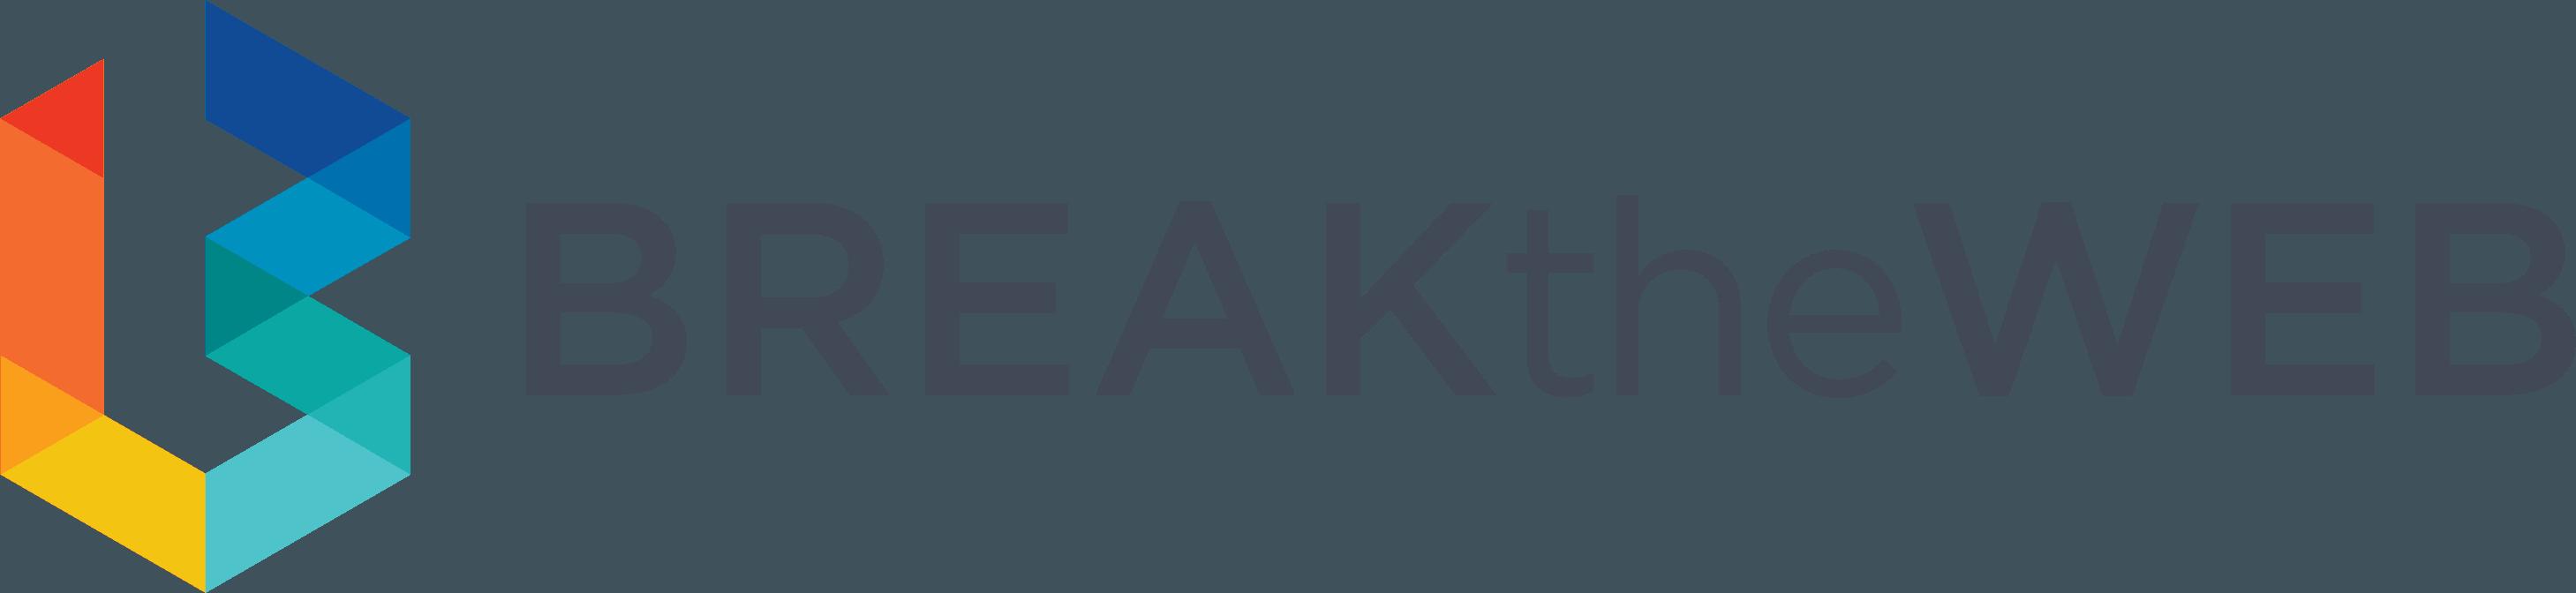 BreakTheWeb